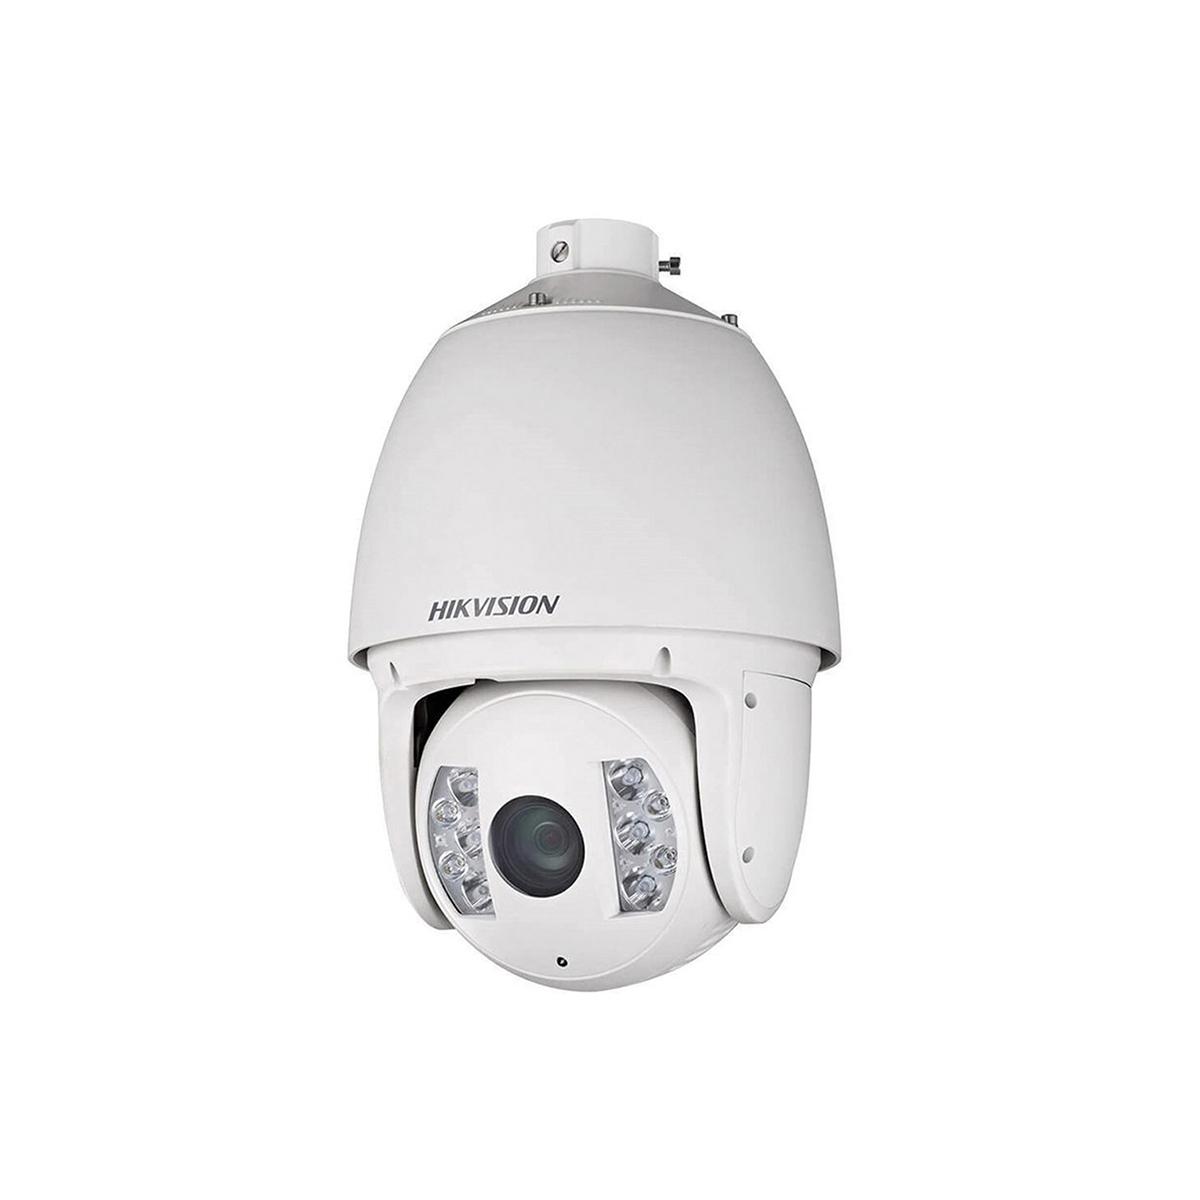 Cámara Hikvision IP PTZ DS-2DE7220IW-AE 2MP